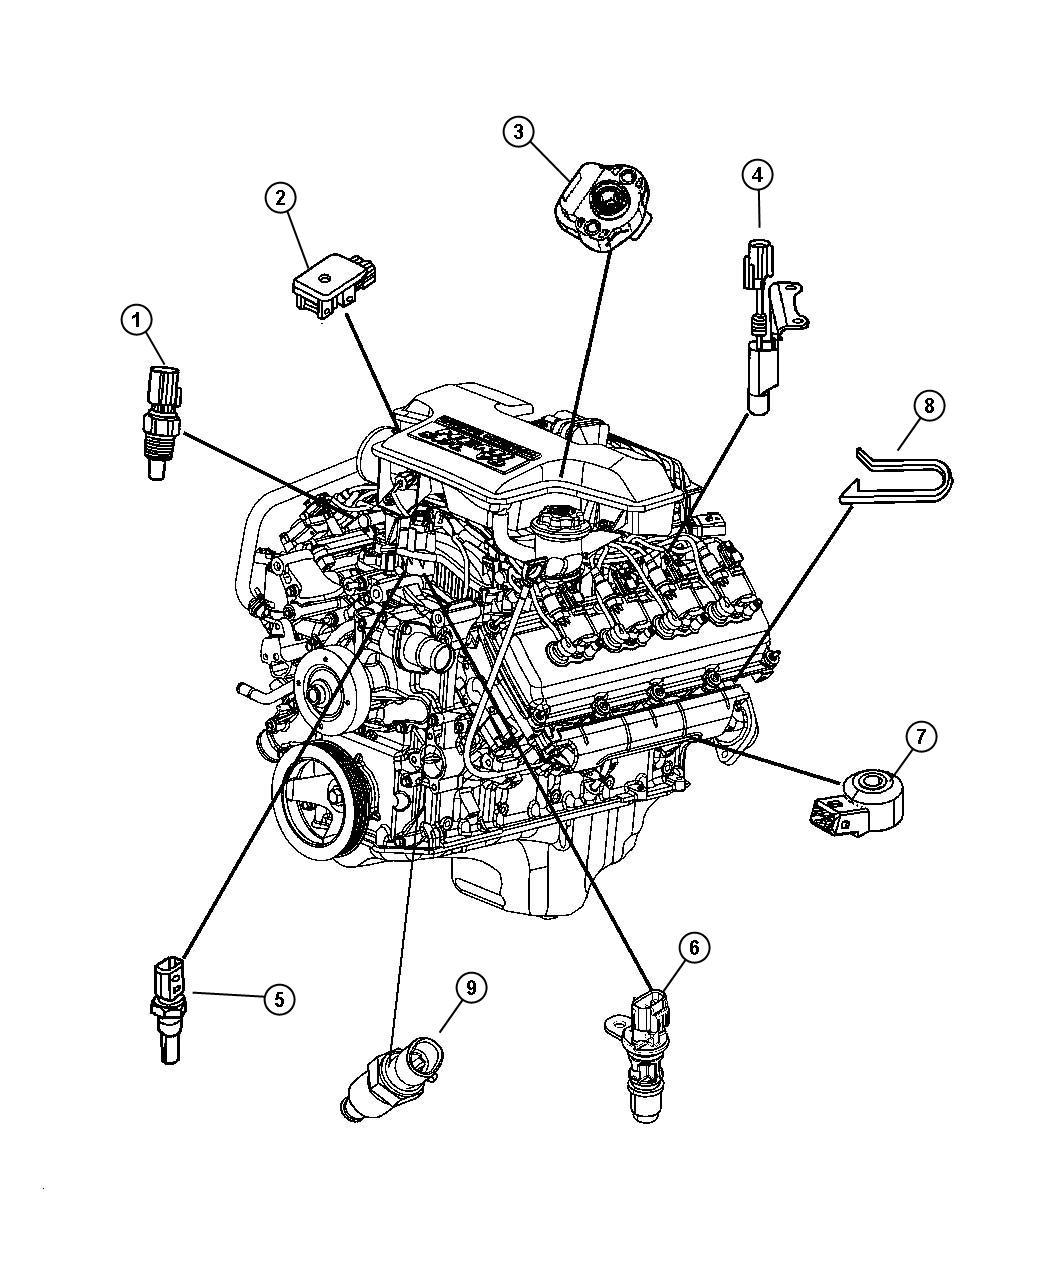 5 7l hemi engine diagram